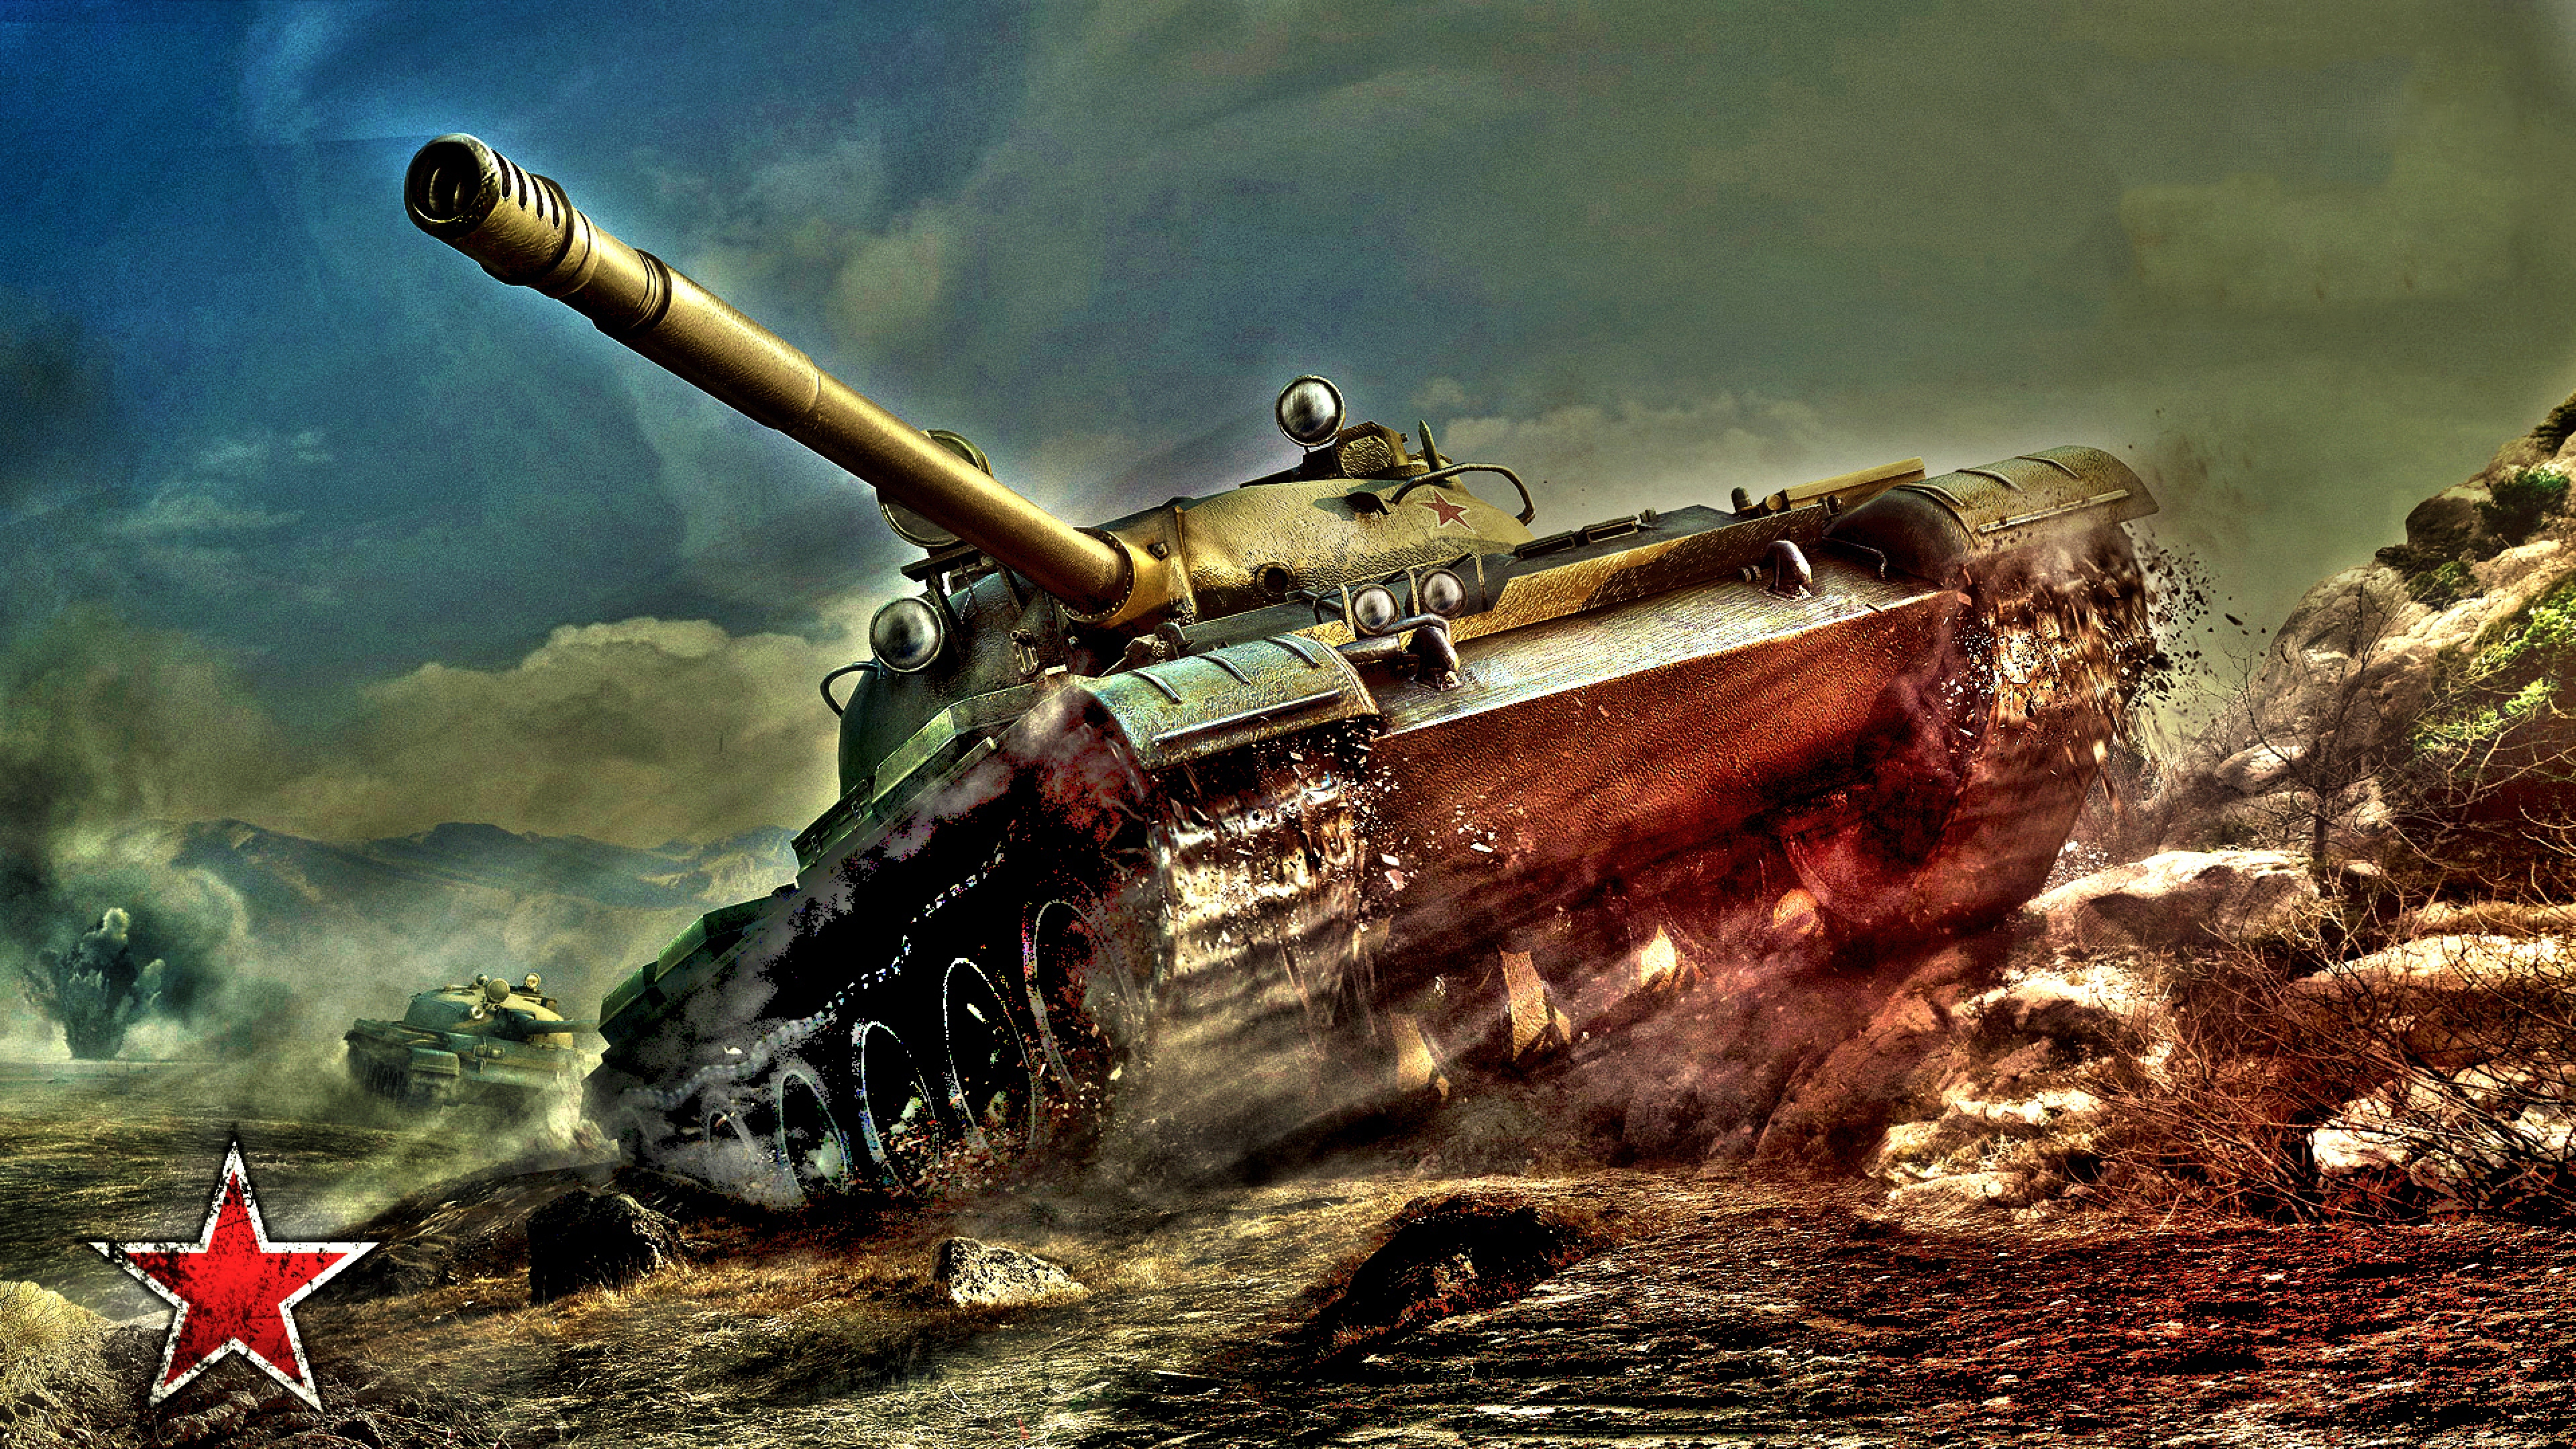 world of tanks 2 1535966496 - World Of Tanks 2 - xbox games wallpapers, world of tanks wallpapers, games wallpapers